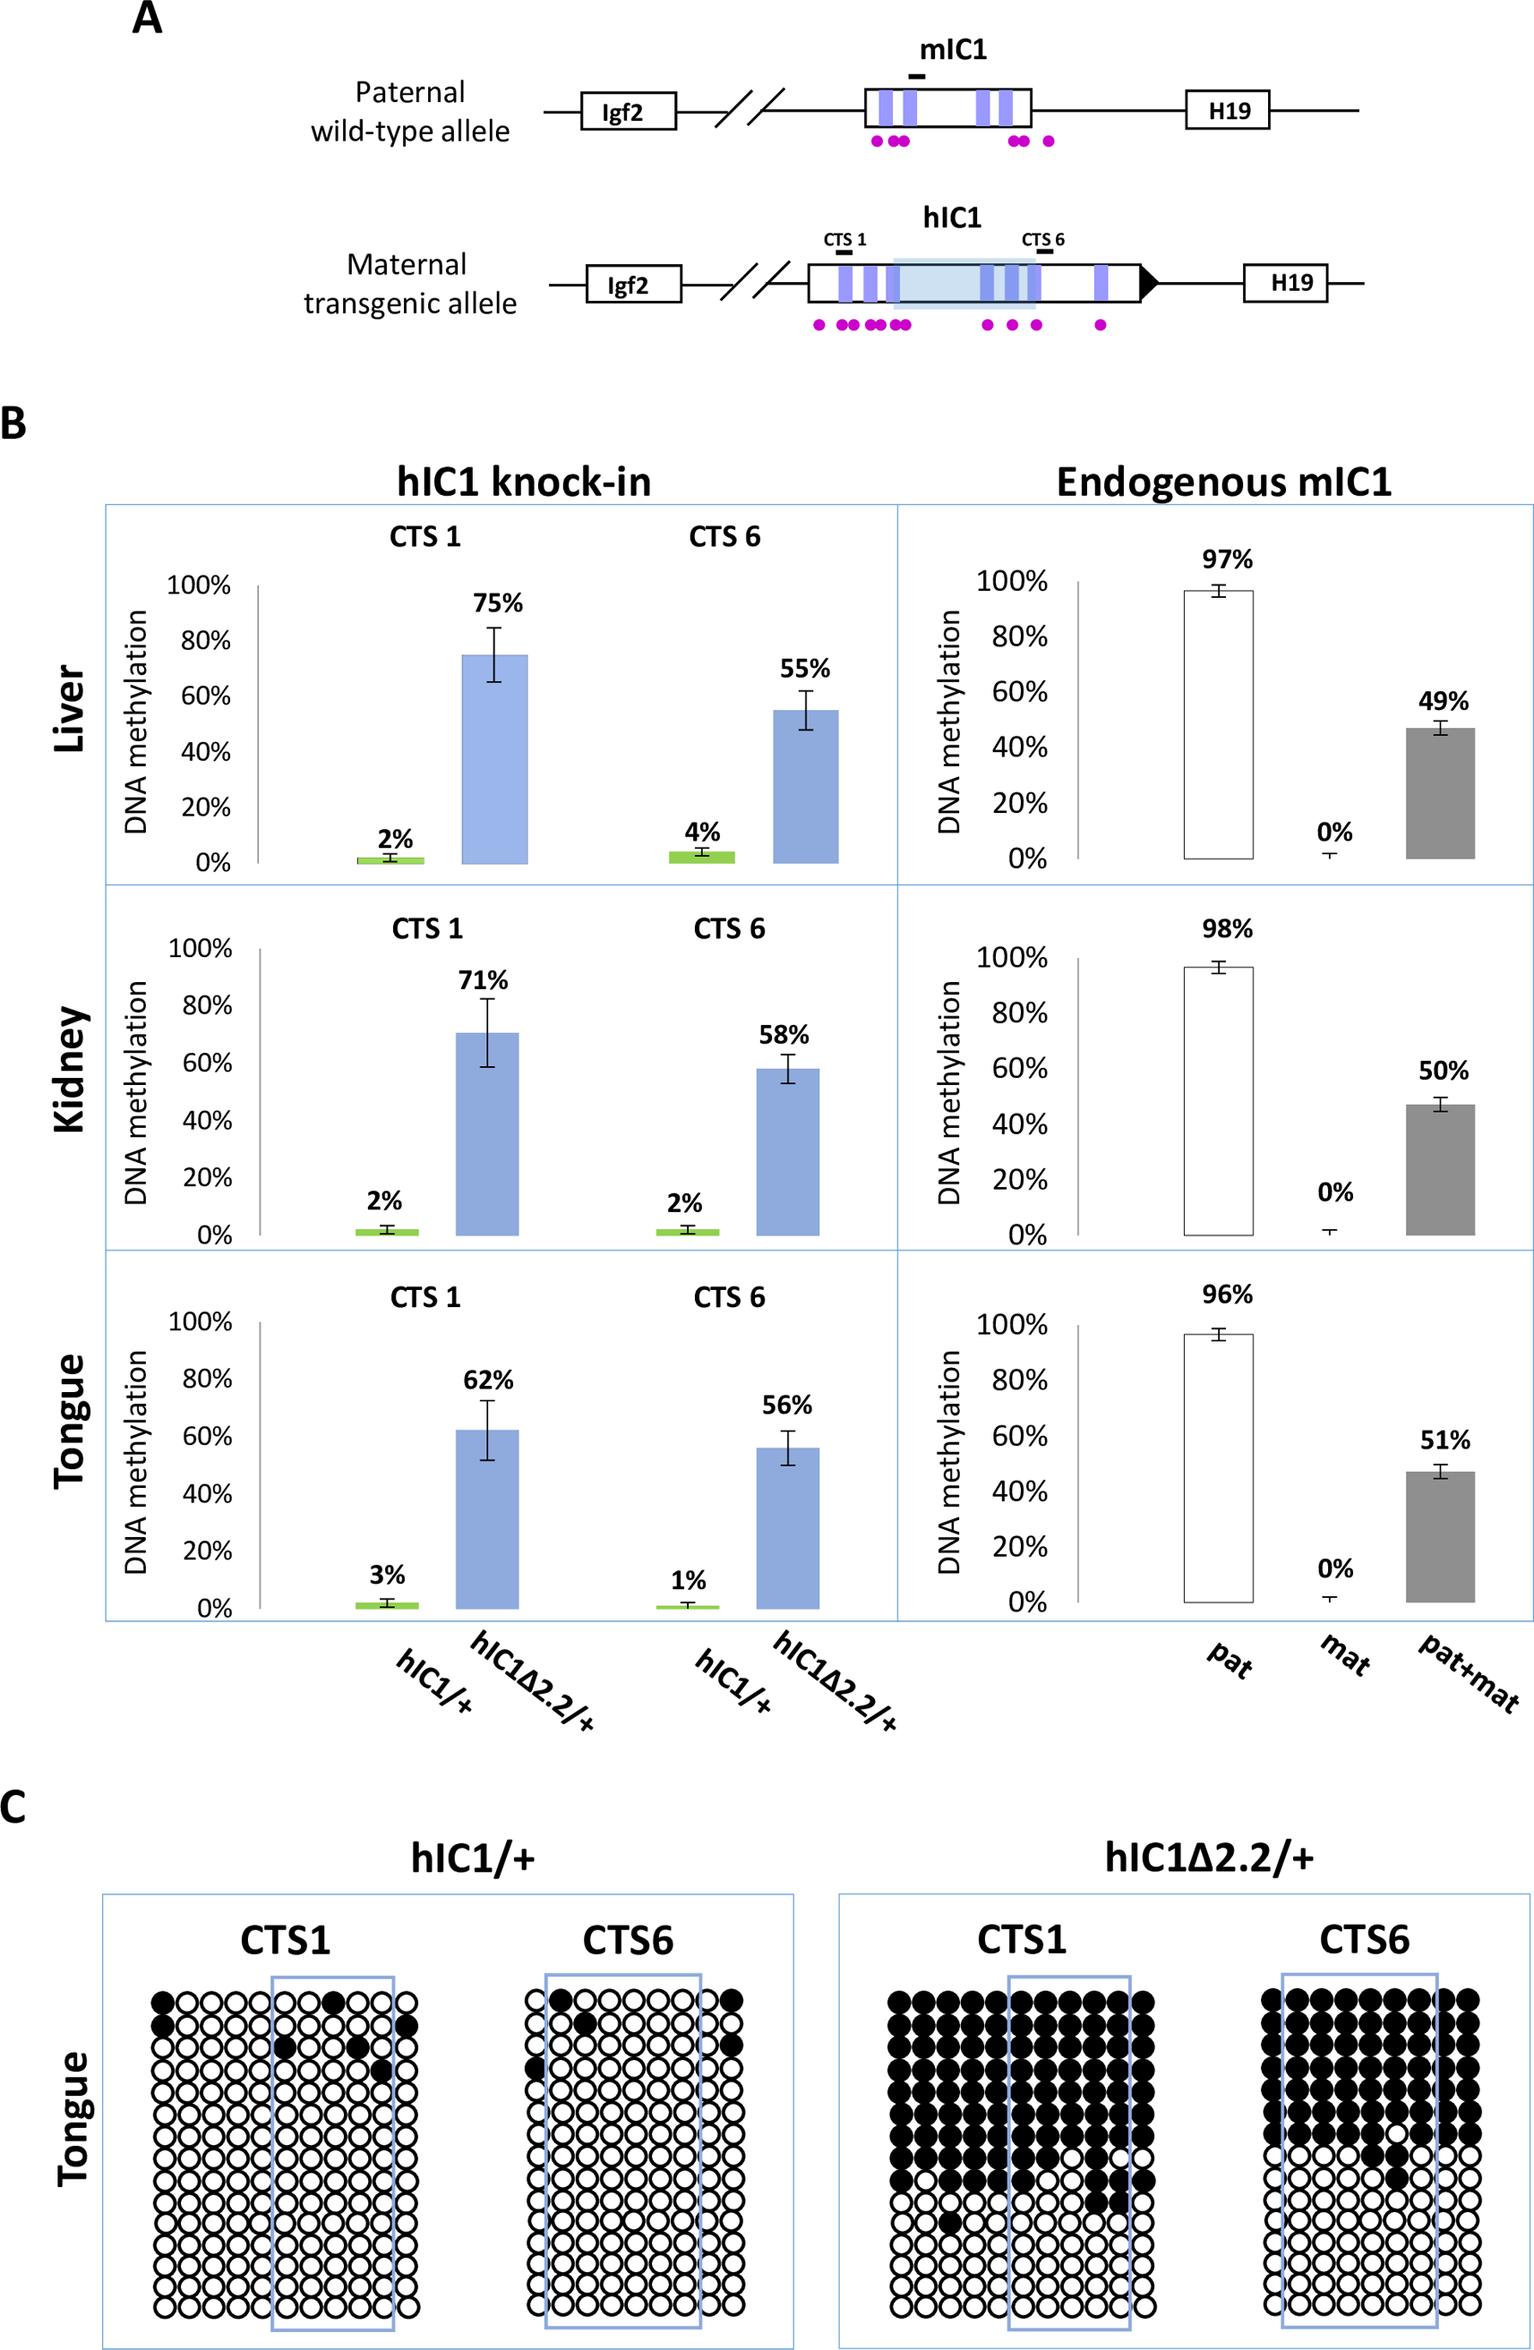 Gain of IC1 methylation in <i>H19</i><sup><i>hIC1</i>Δ<i>2</i>.<i>2/+</i></sup> mice.